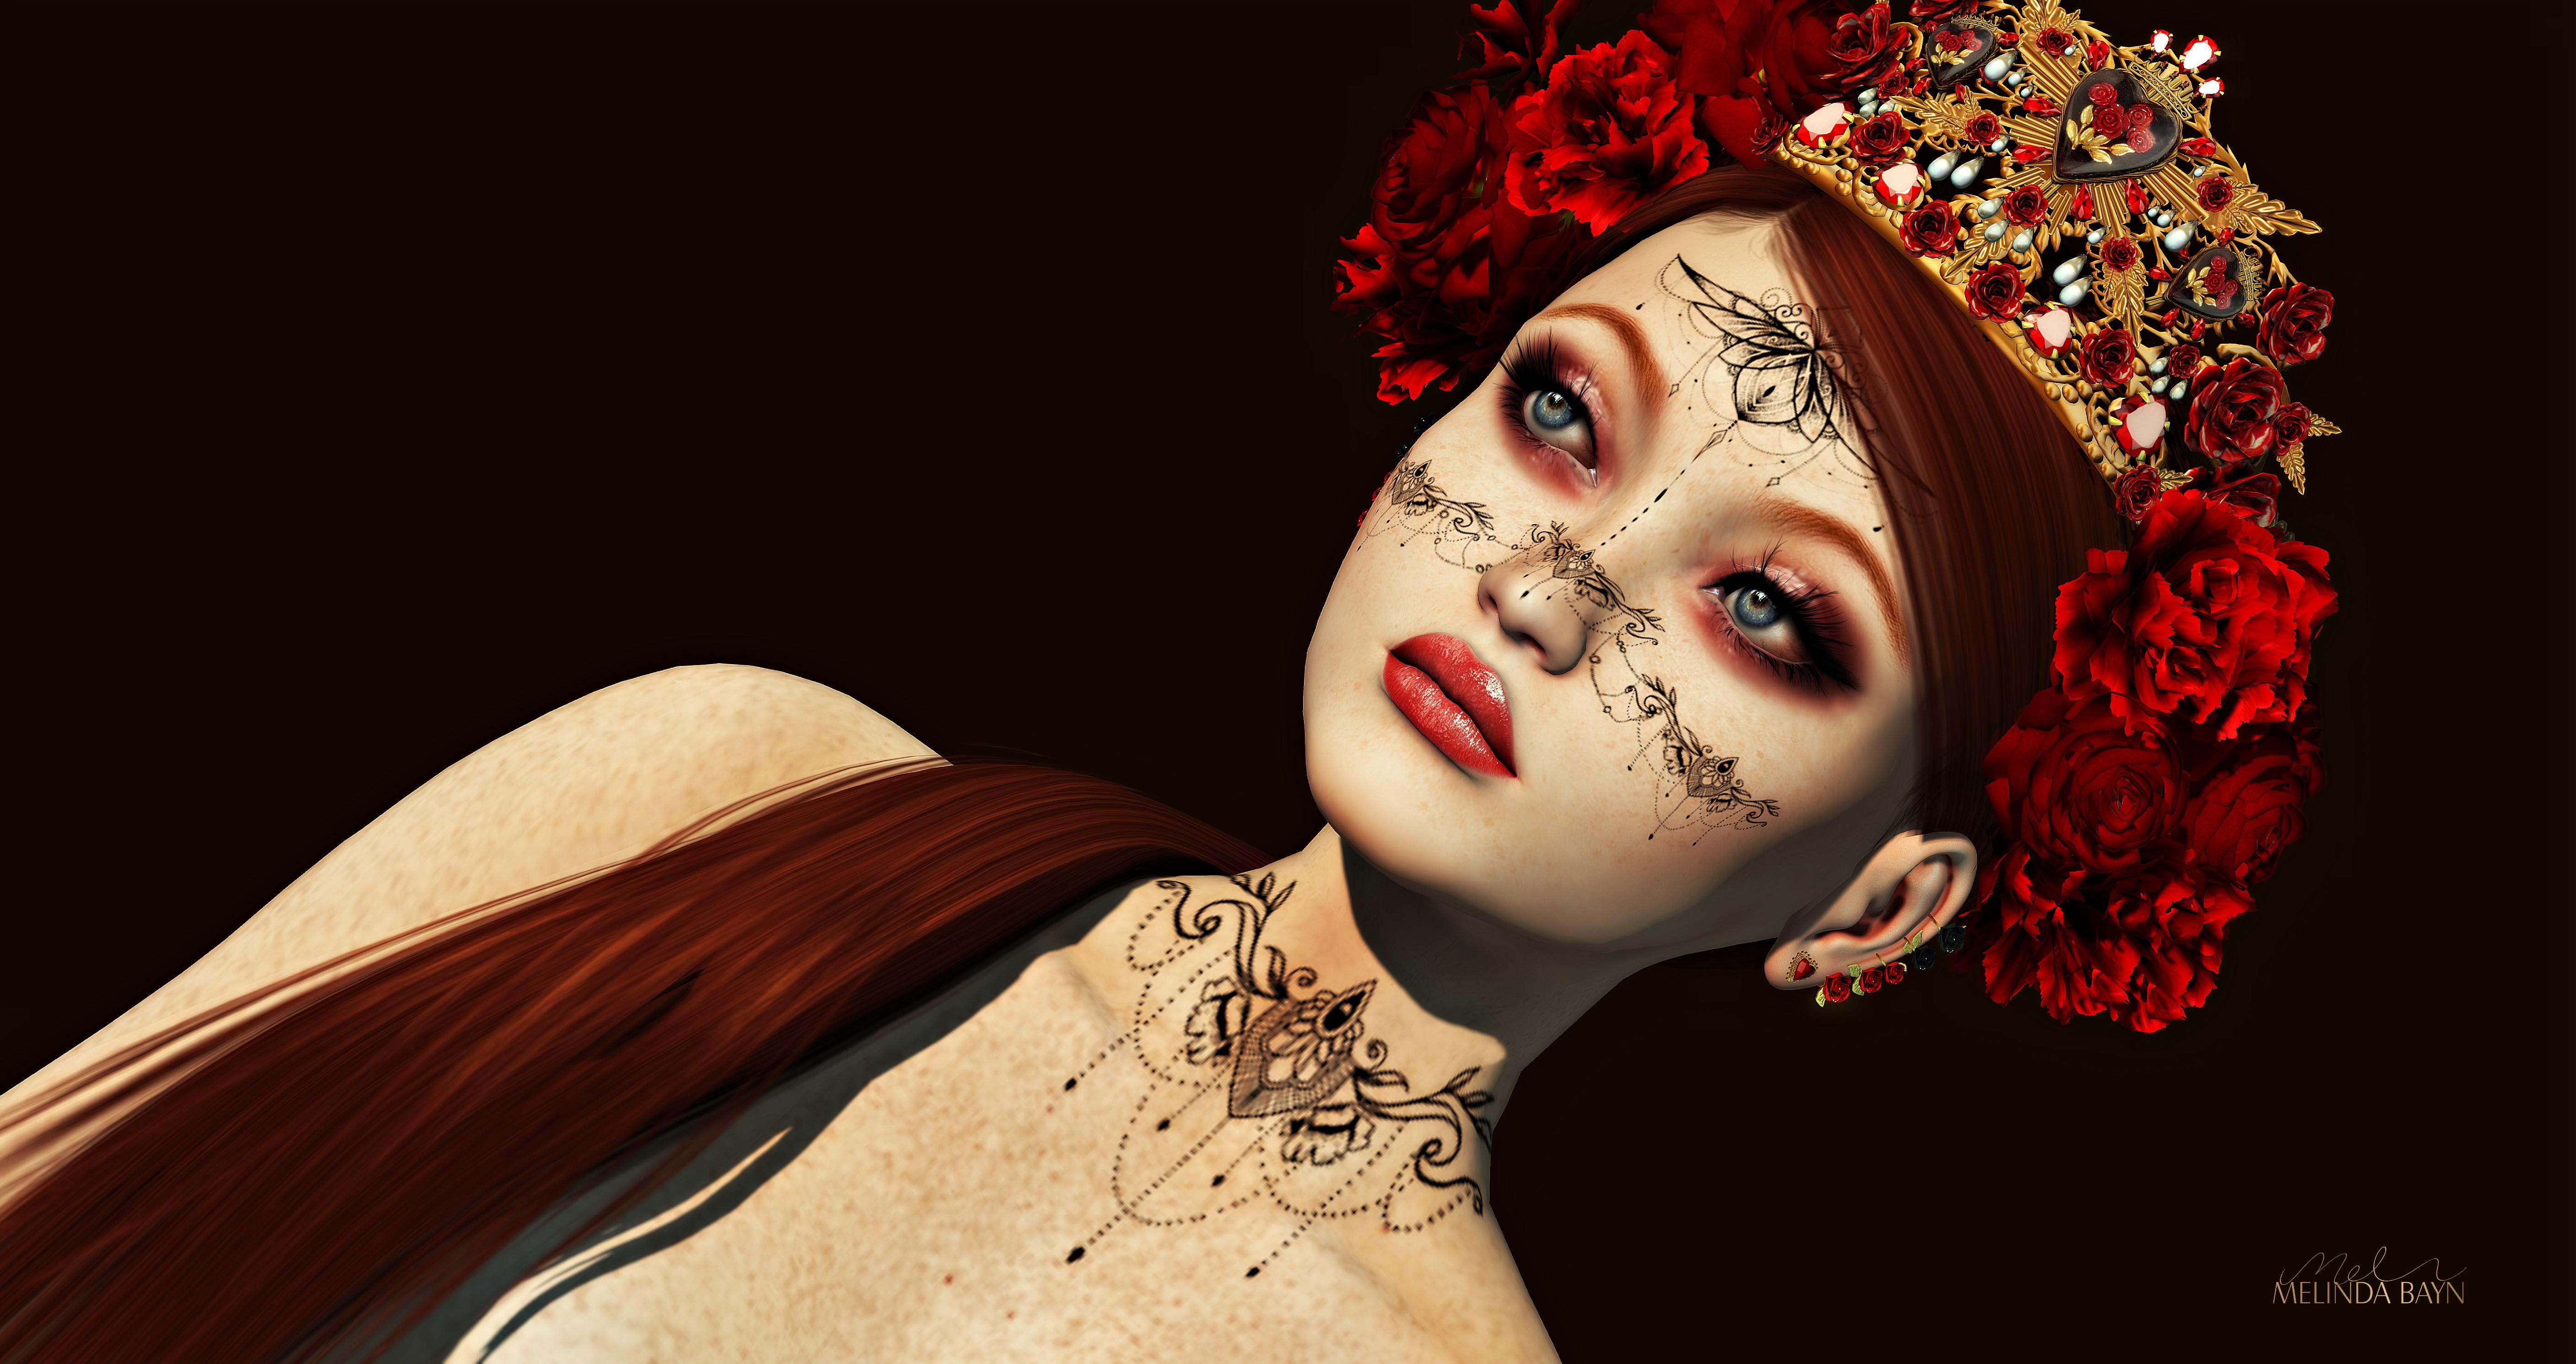 Melinda Bayn 711/2020 ANDORE Mesh Ears ROZY – Impulse Elela Tattoo Bom – GO Hued HD Lipstick Makeup